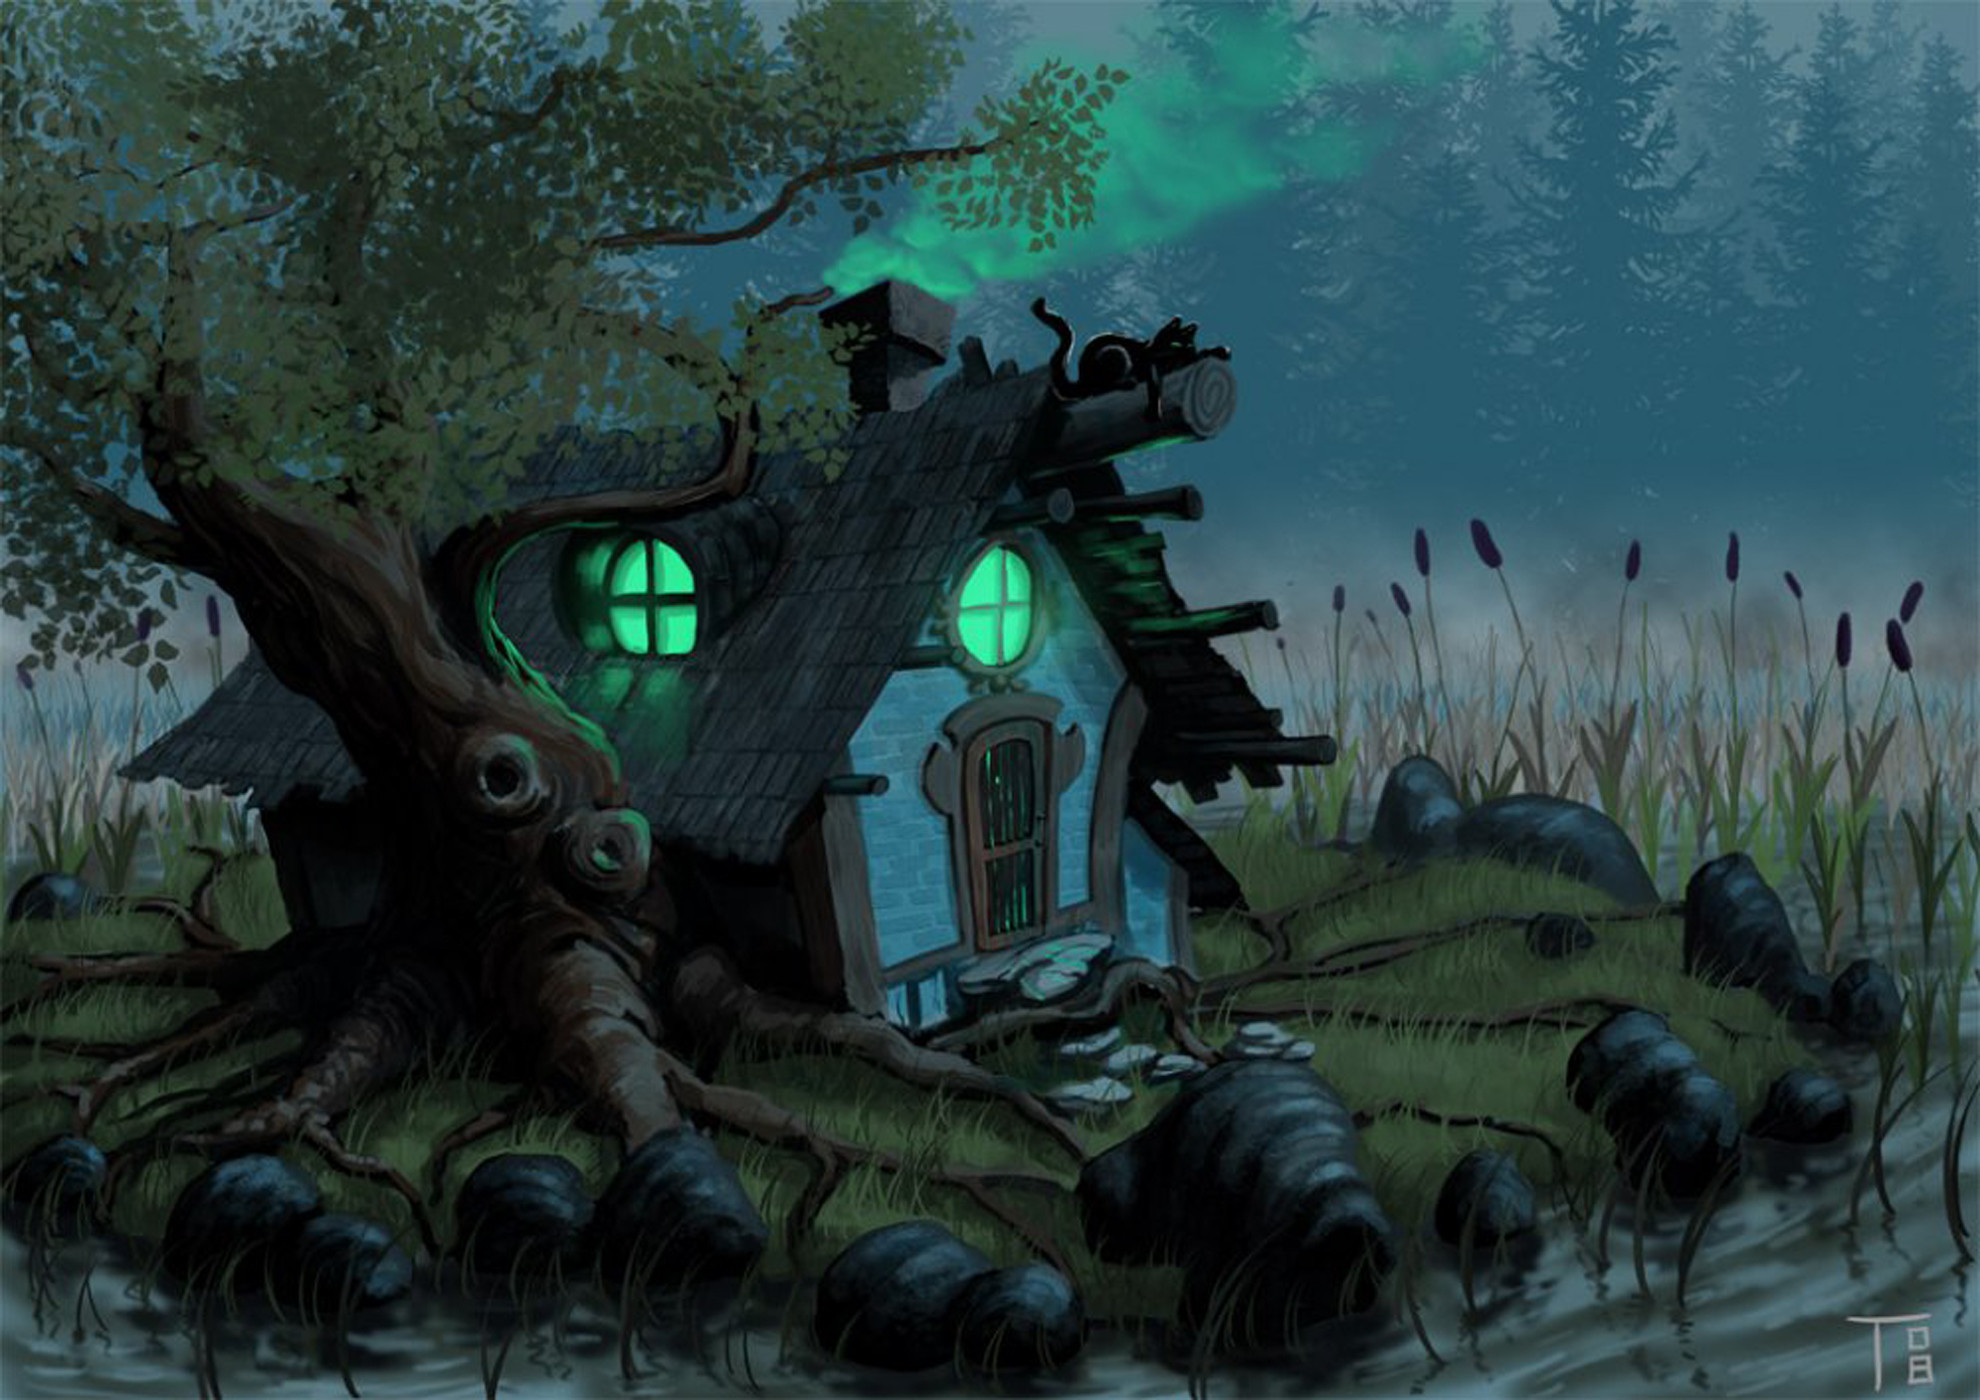 Halloween animated desktop wallpaper 60 images - Moving spider desktop ...